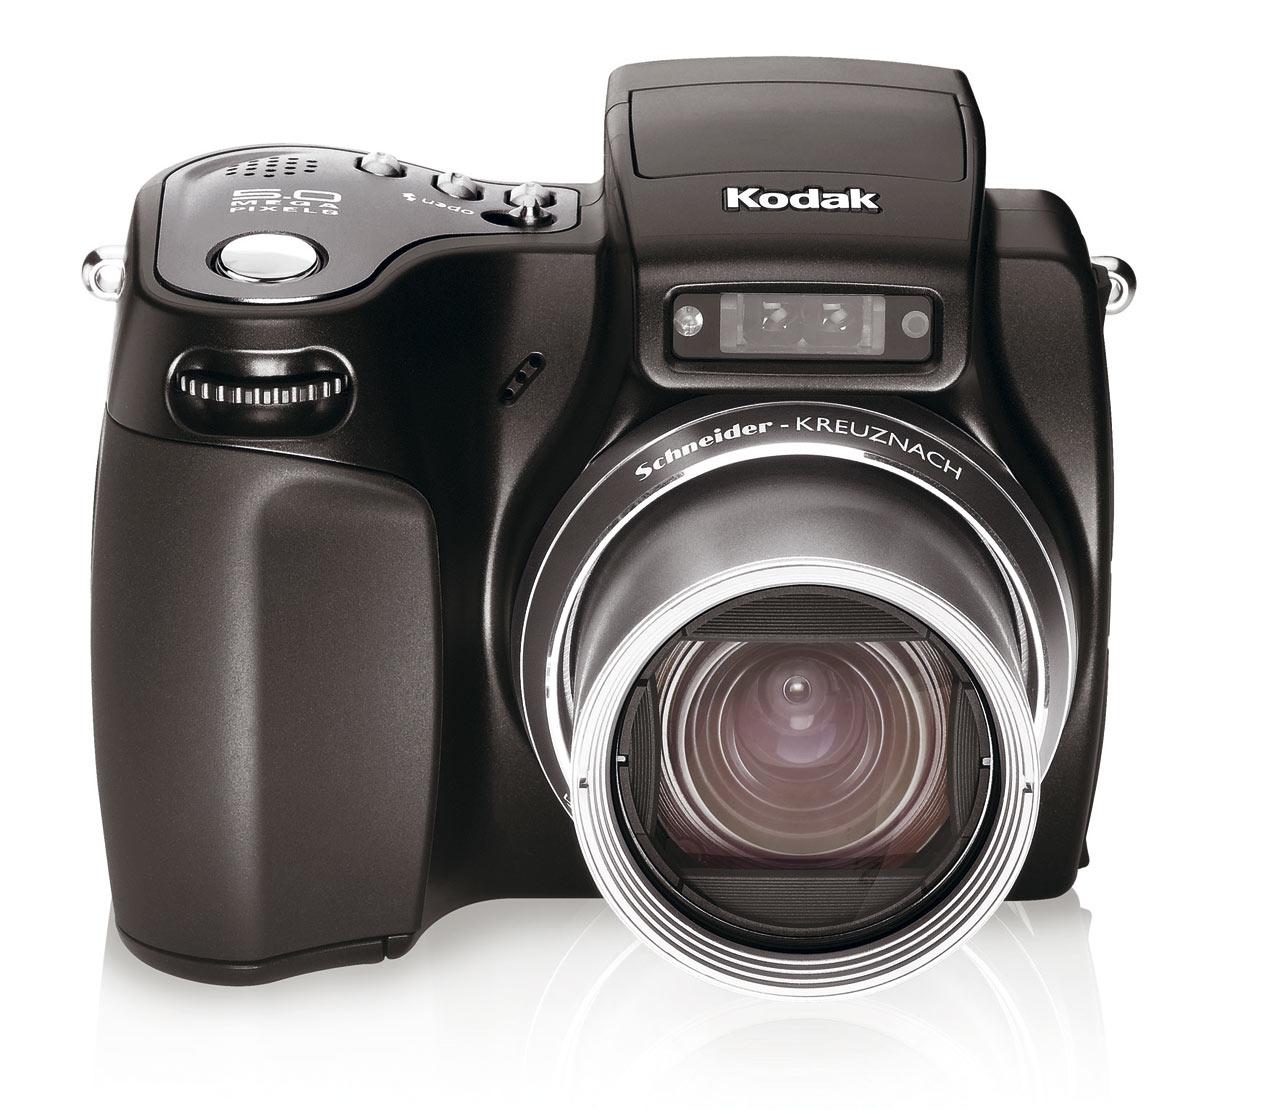 kodak easyshare dx7590 digital photography review